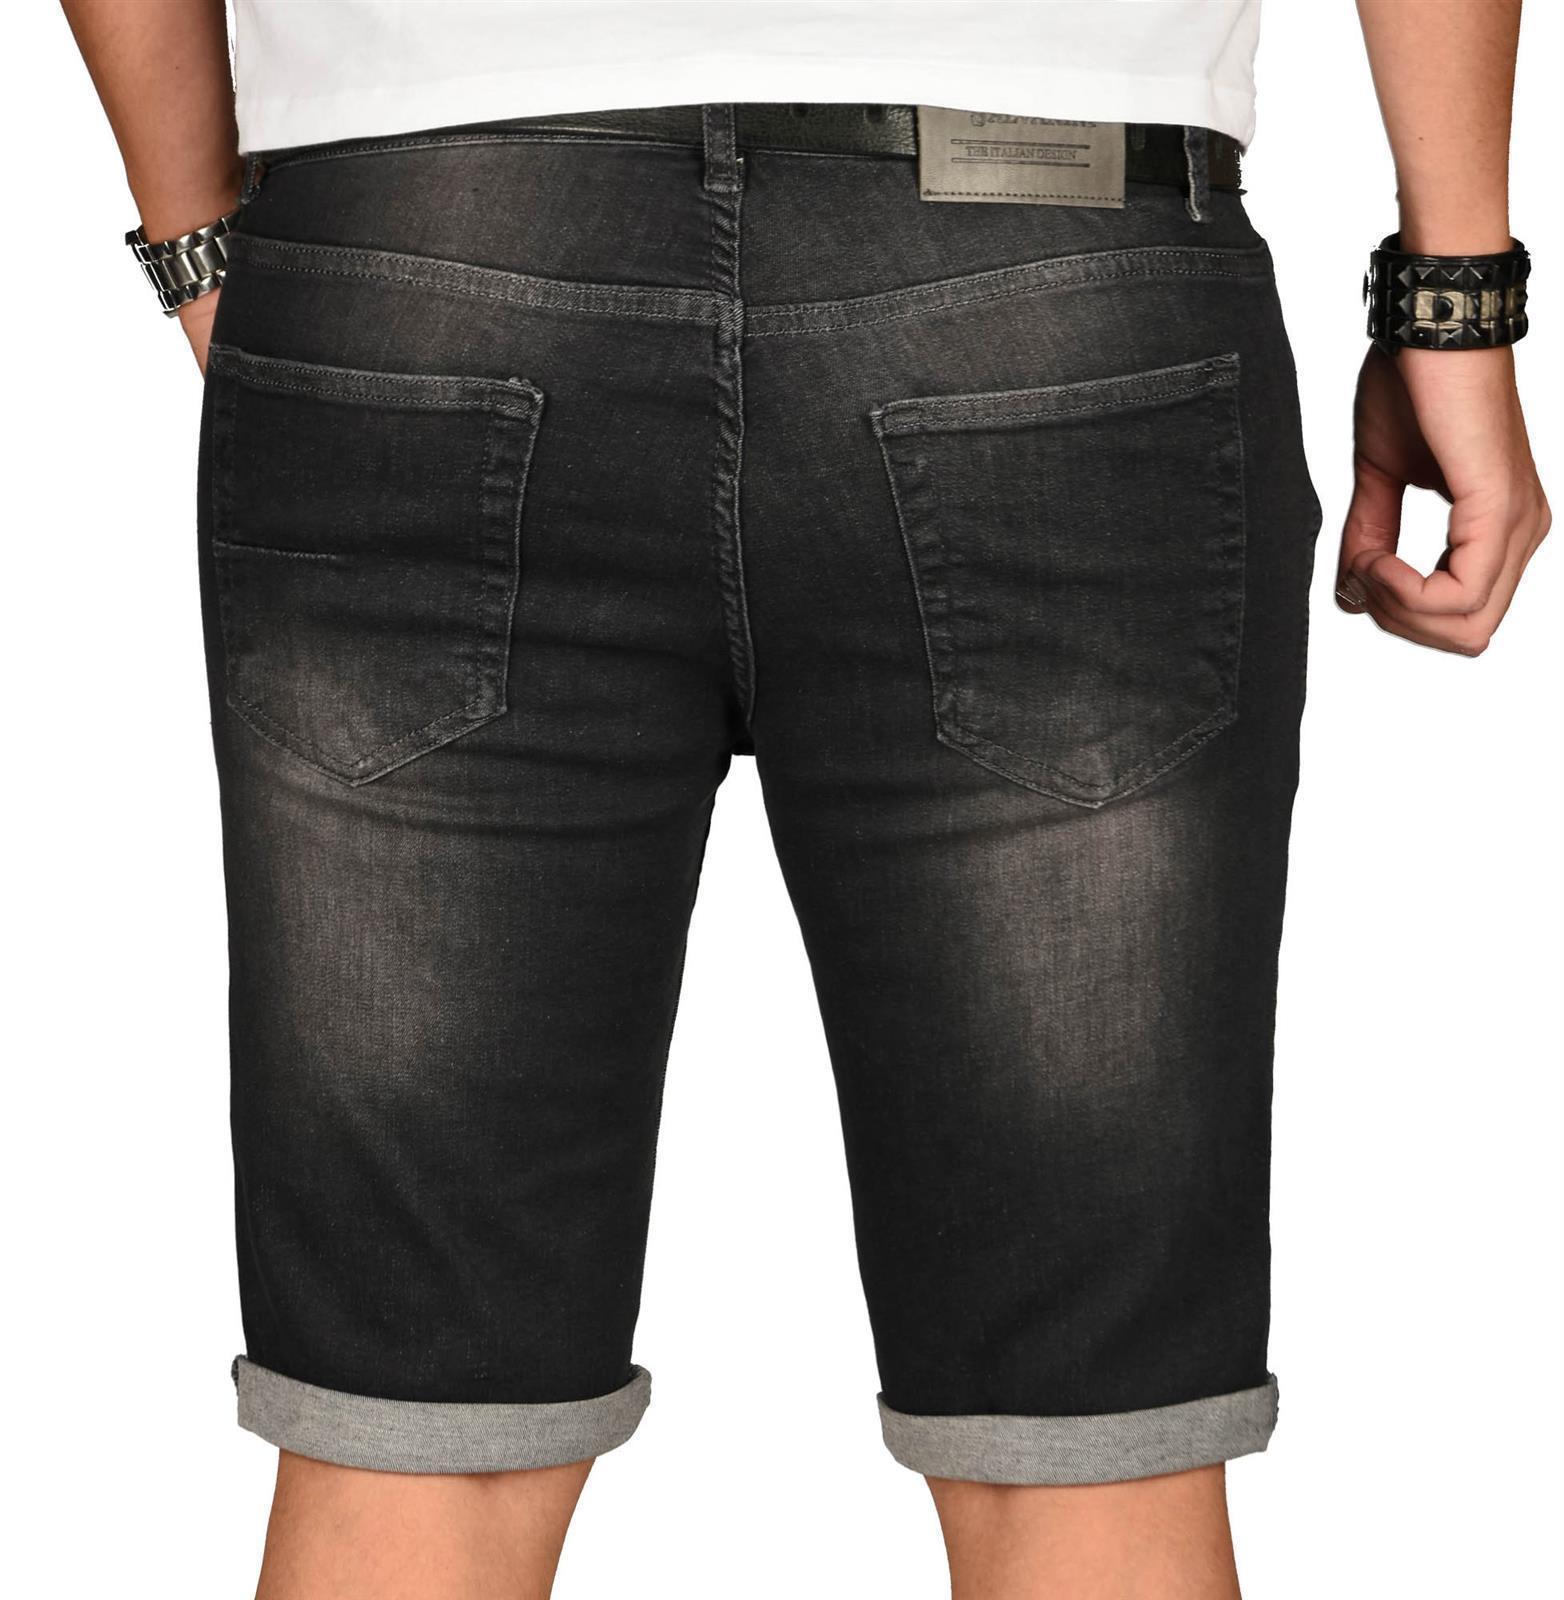 A-Salvarini-Herren-Designer-Jeans-Short-kurze-Hose-Slim-Sommer-Shorts-Washed Indexbild 49